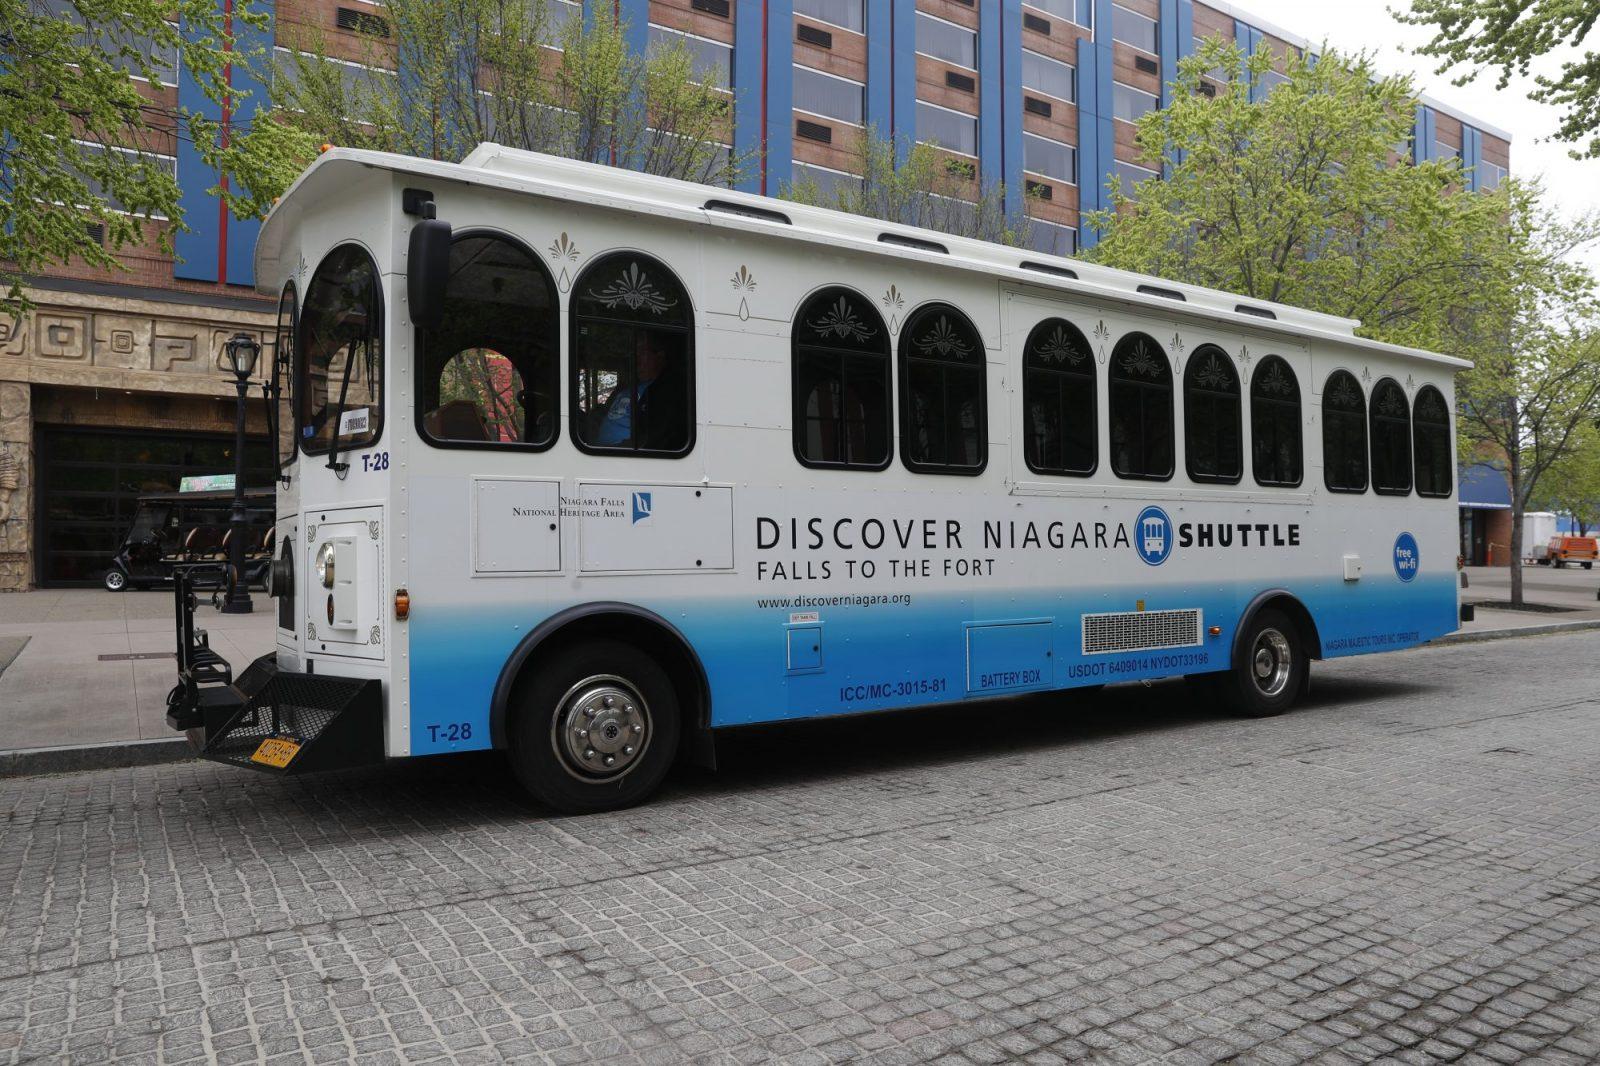 discover niagara shuttle rolls although funding not nailed